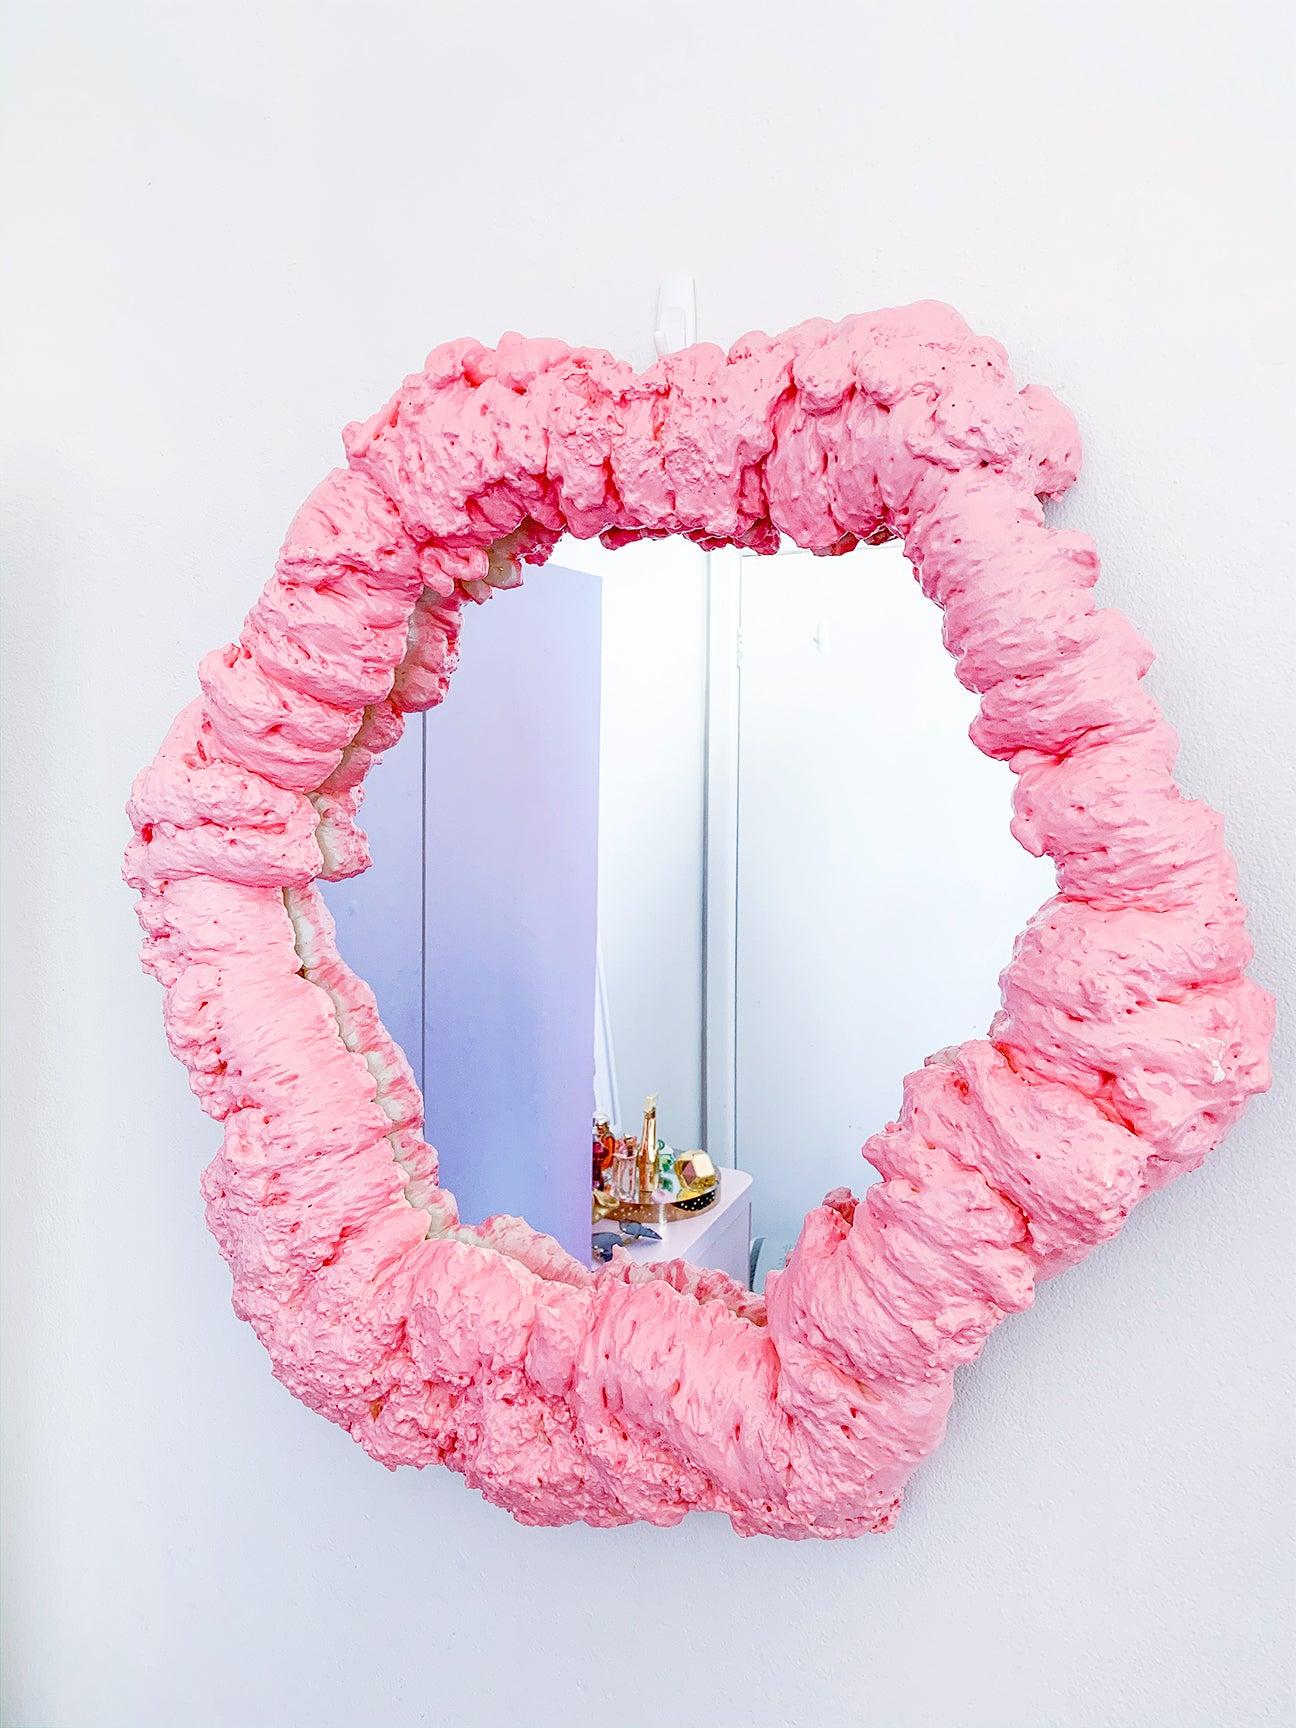 00-FEATURE-flex-mami-diy-foam-mirror-domino